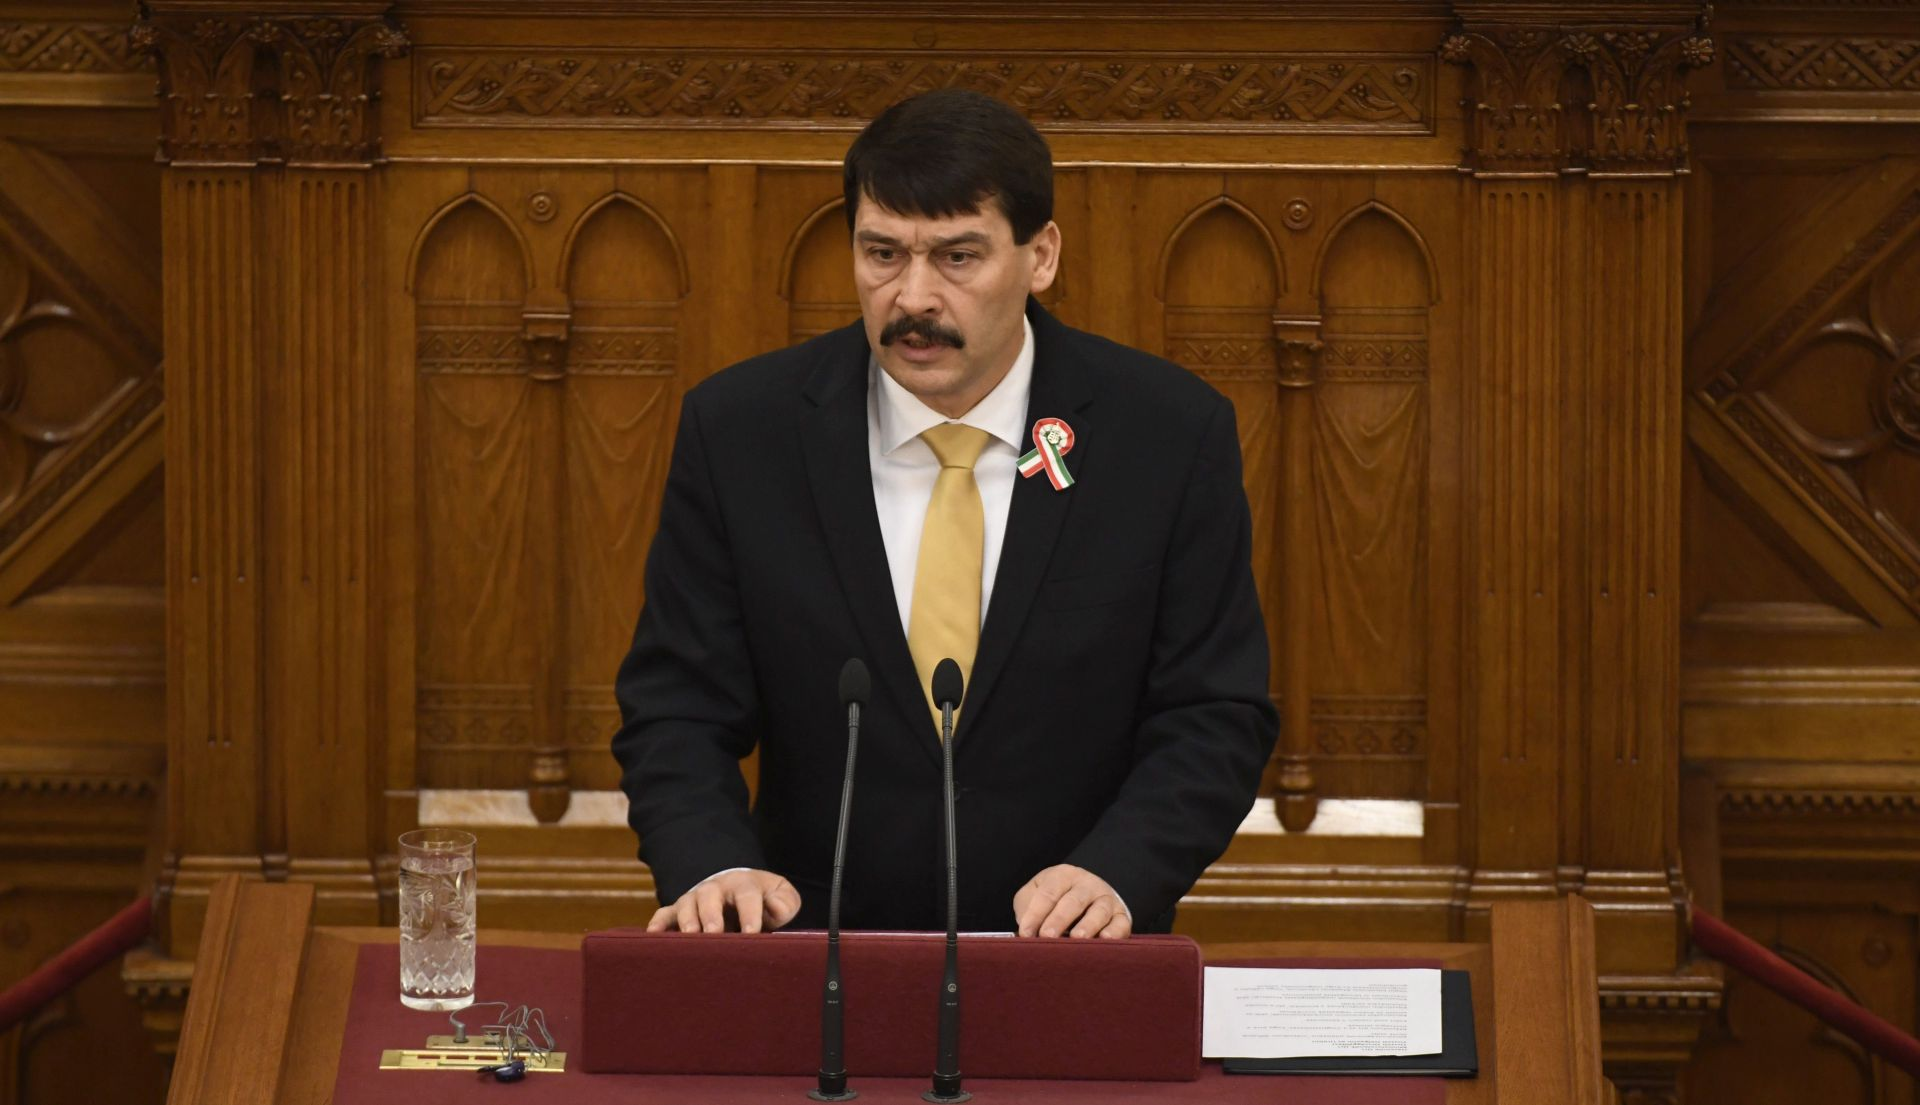 MAĐARSKA Ader ponovno izabran za predsjednika